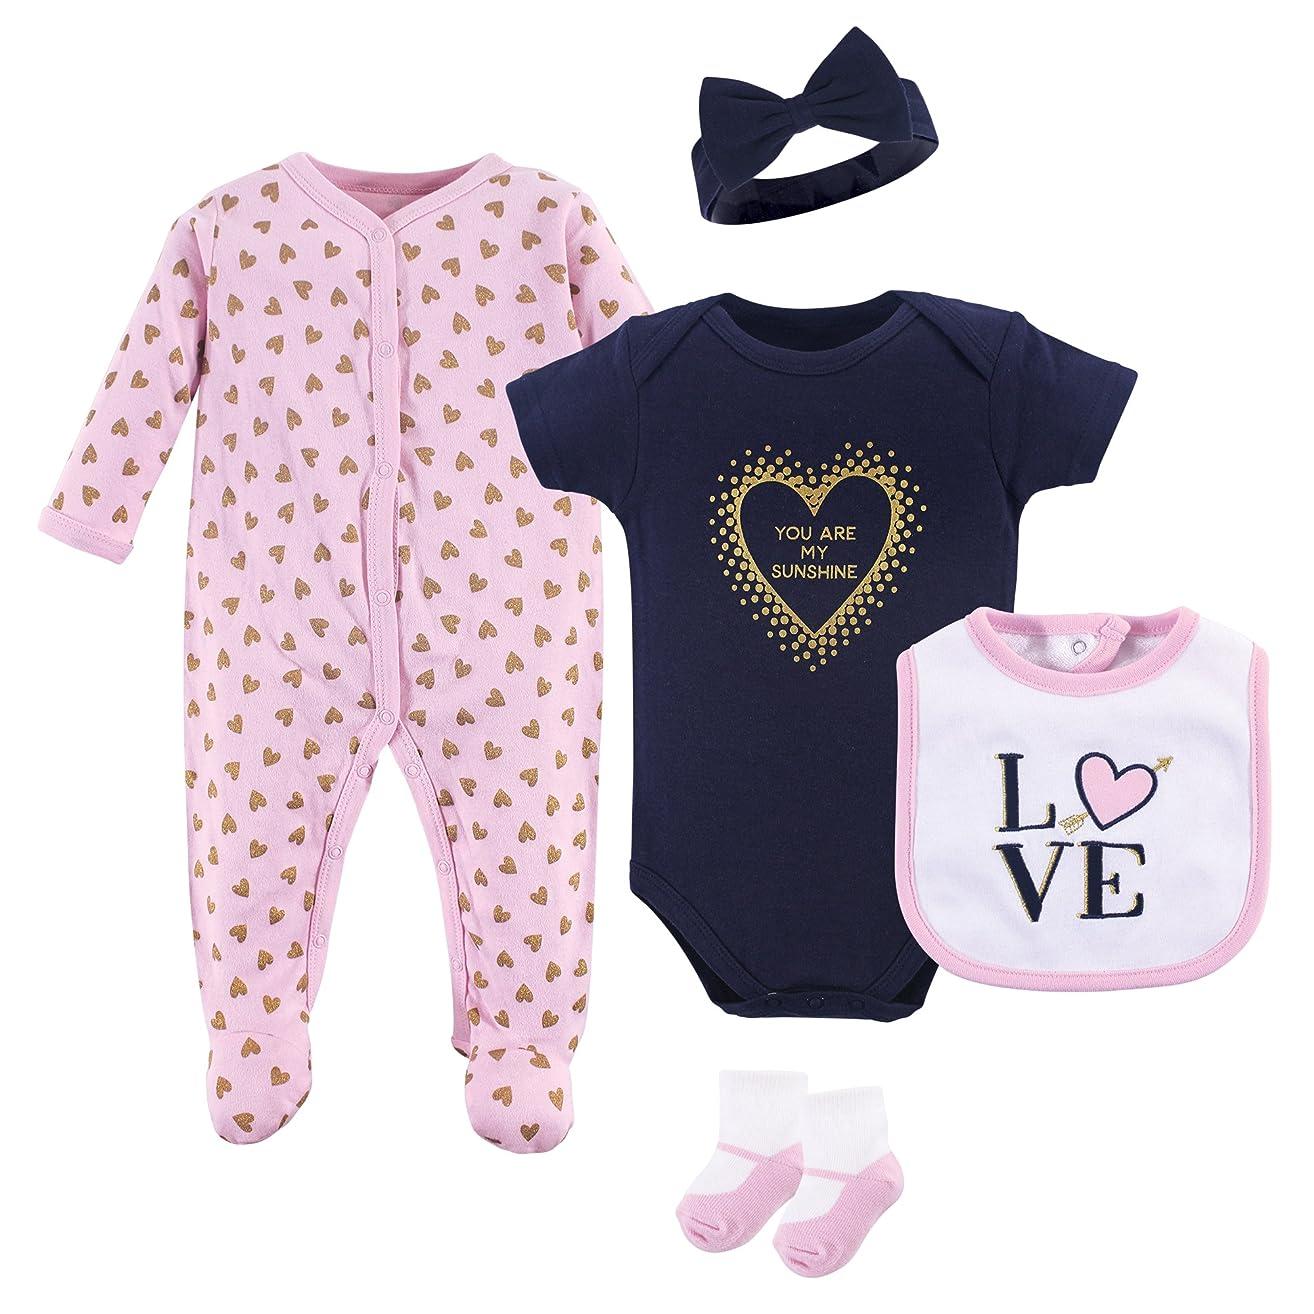 Hudson Baby Baby Multi Piece Clothing Set